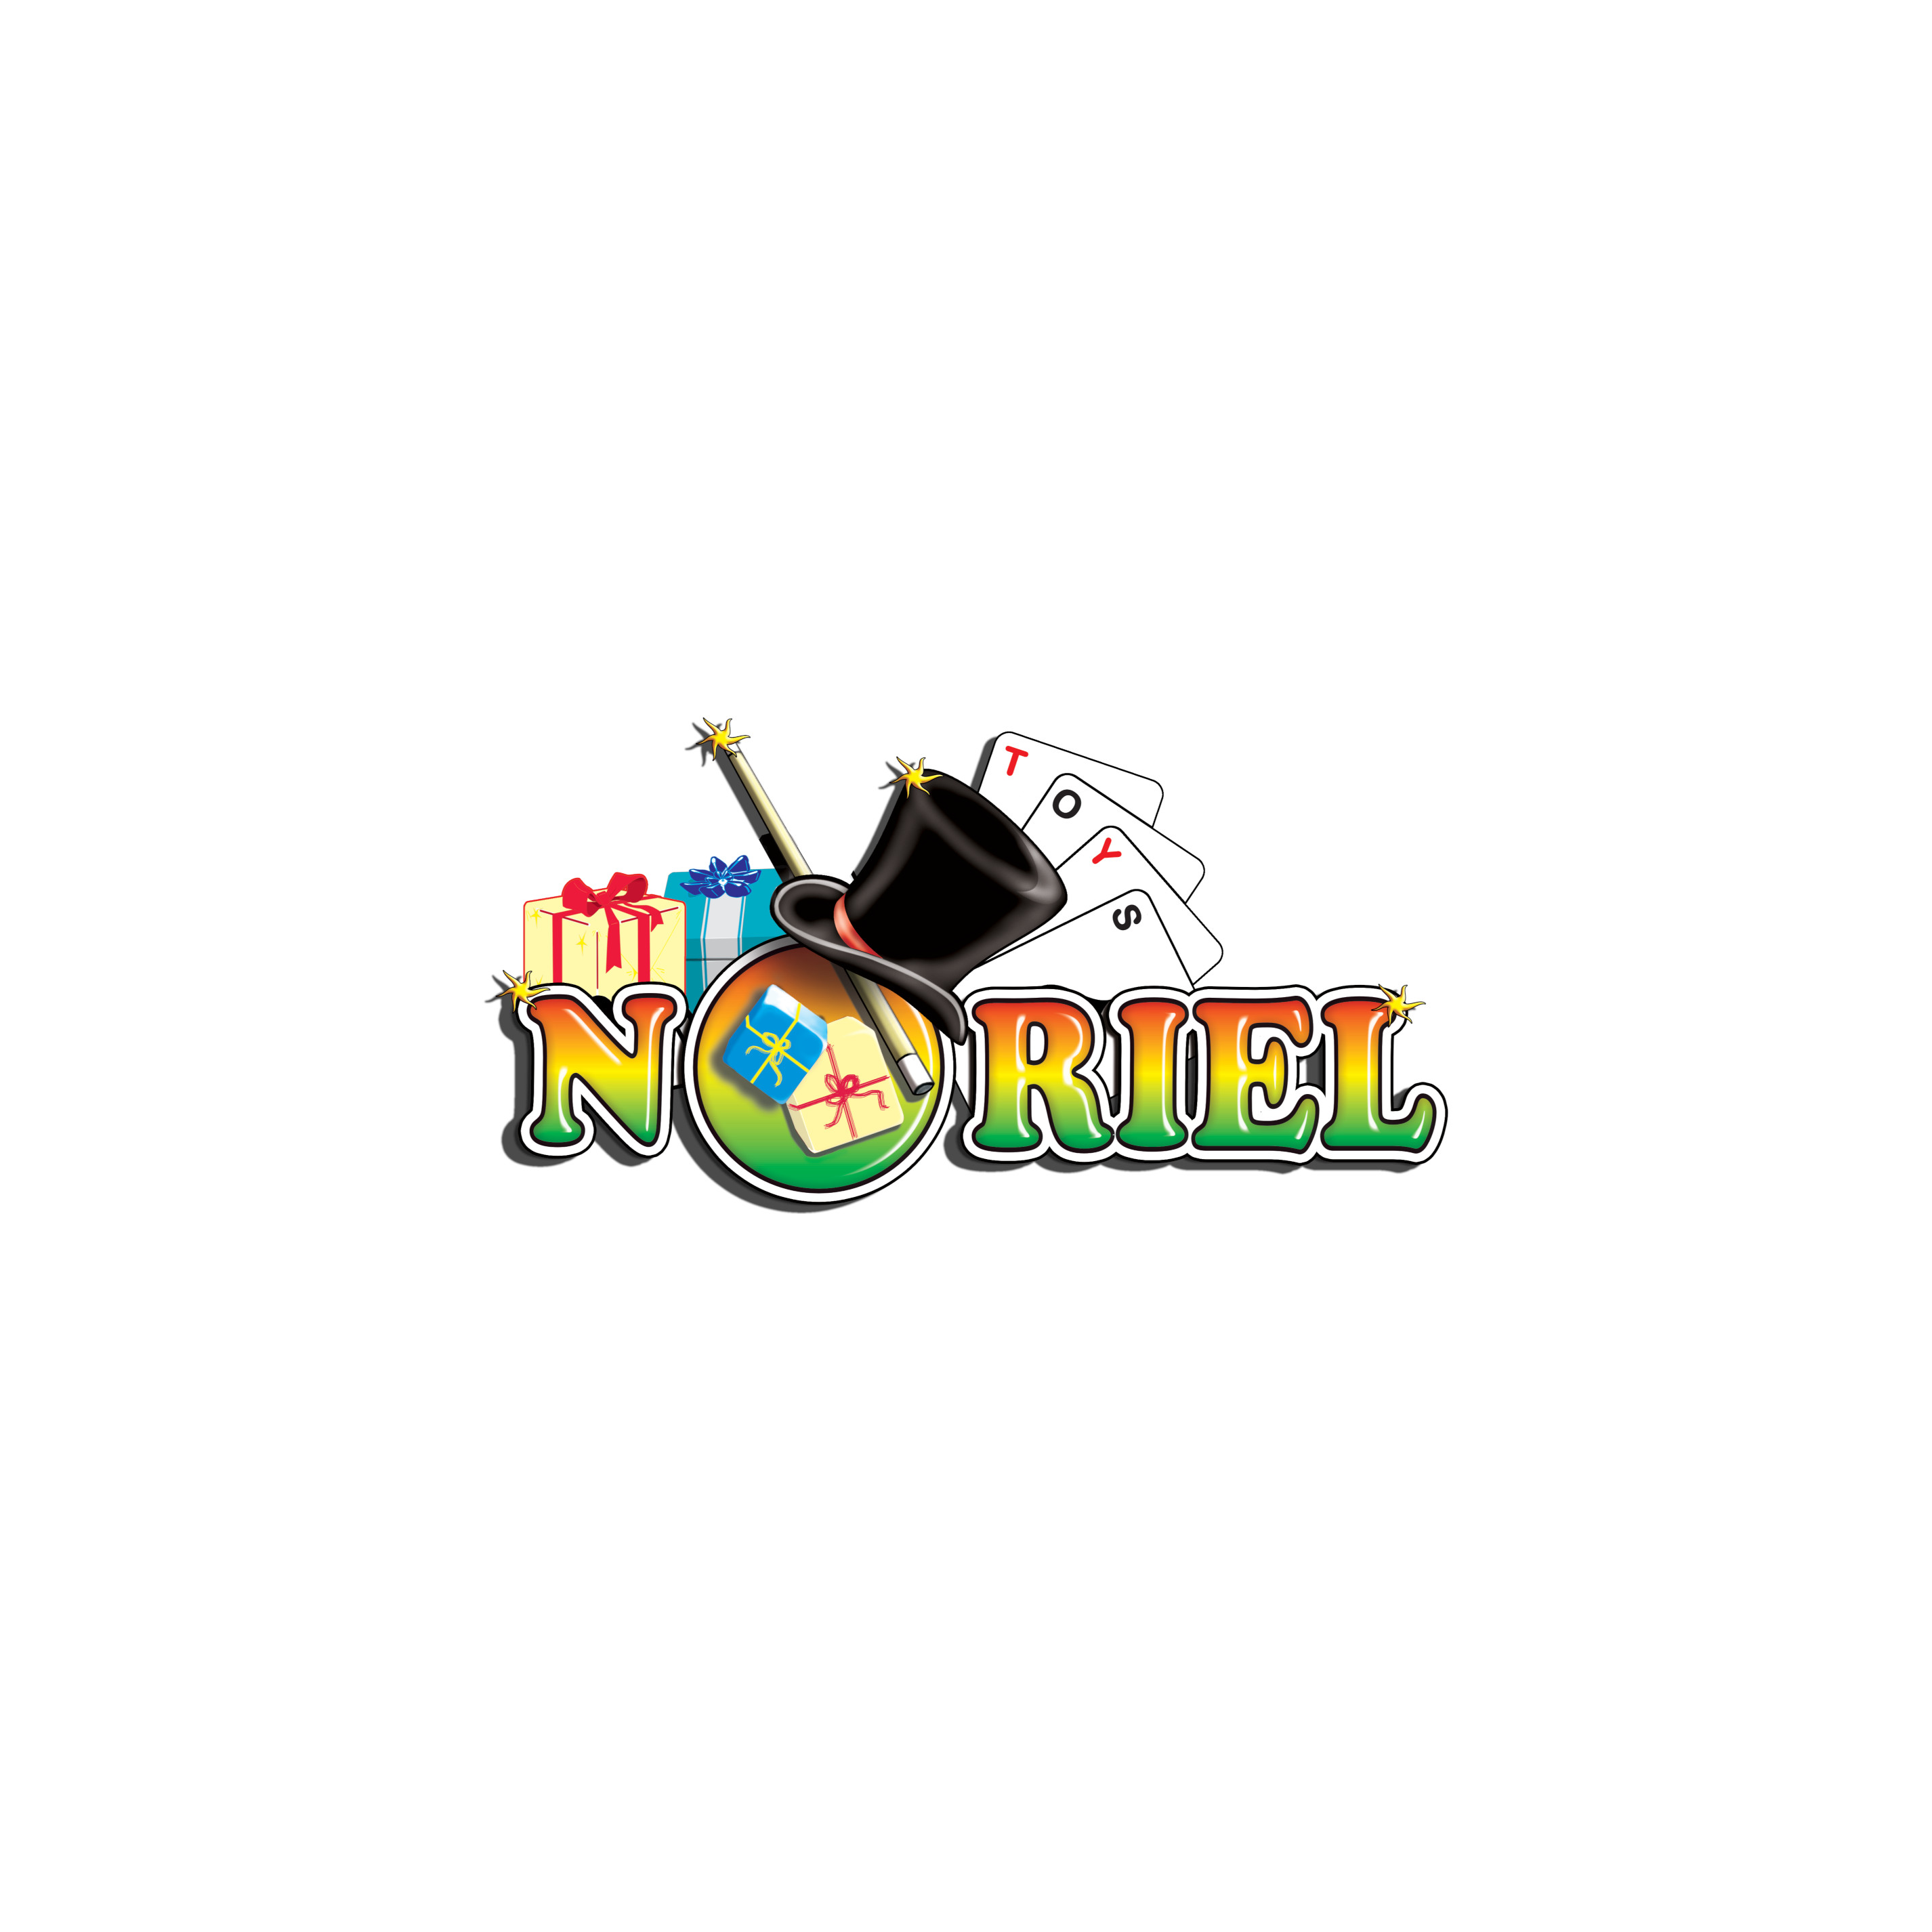 Minimonkey - Sling bumbac 4 in 1, Mov